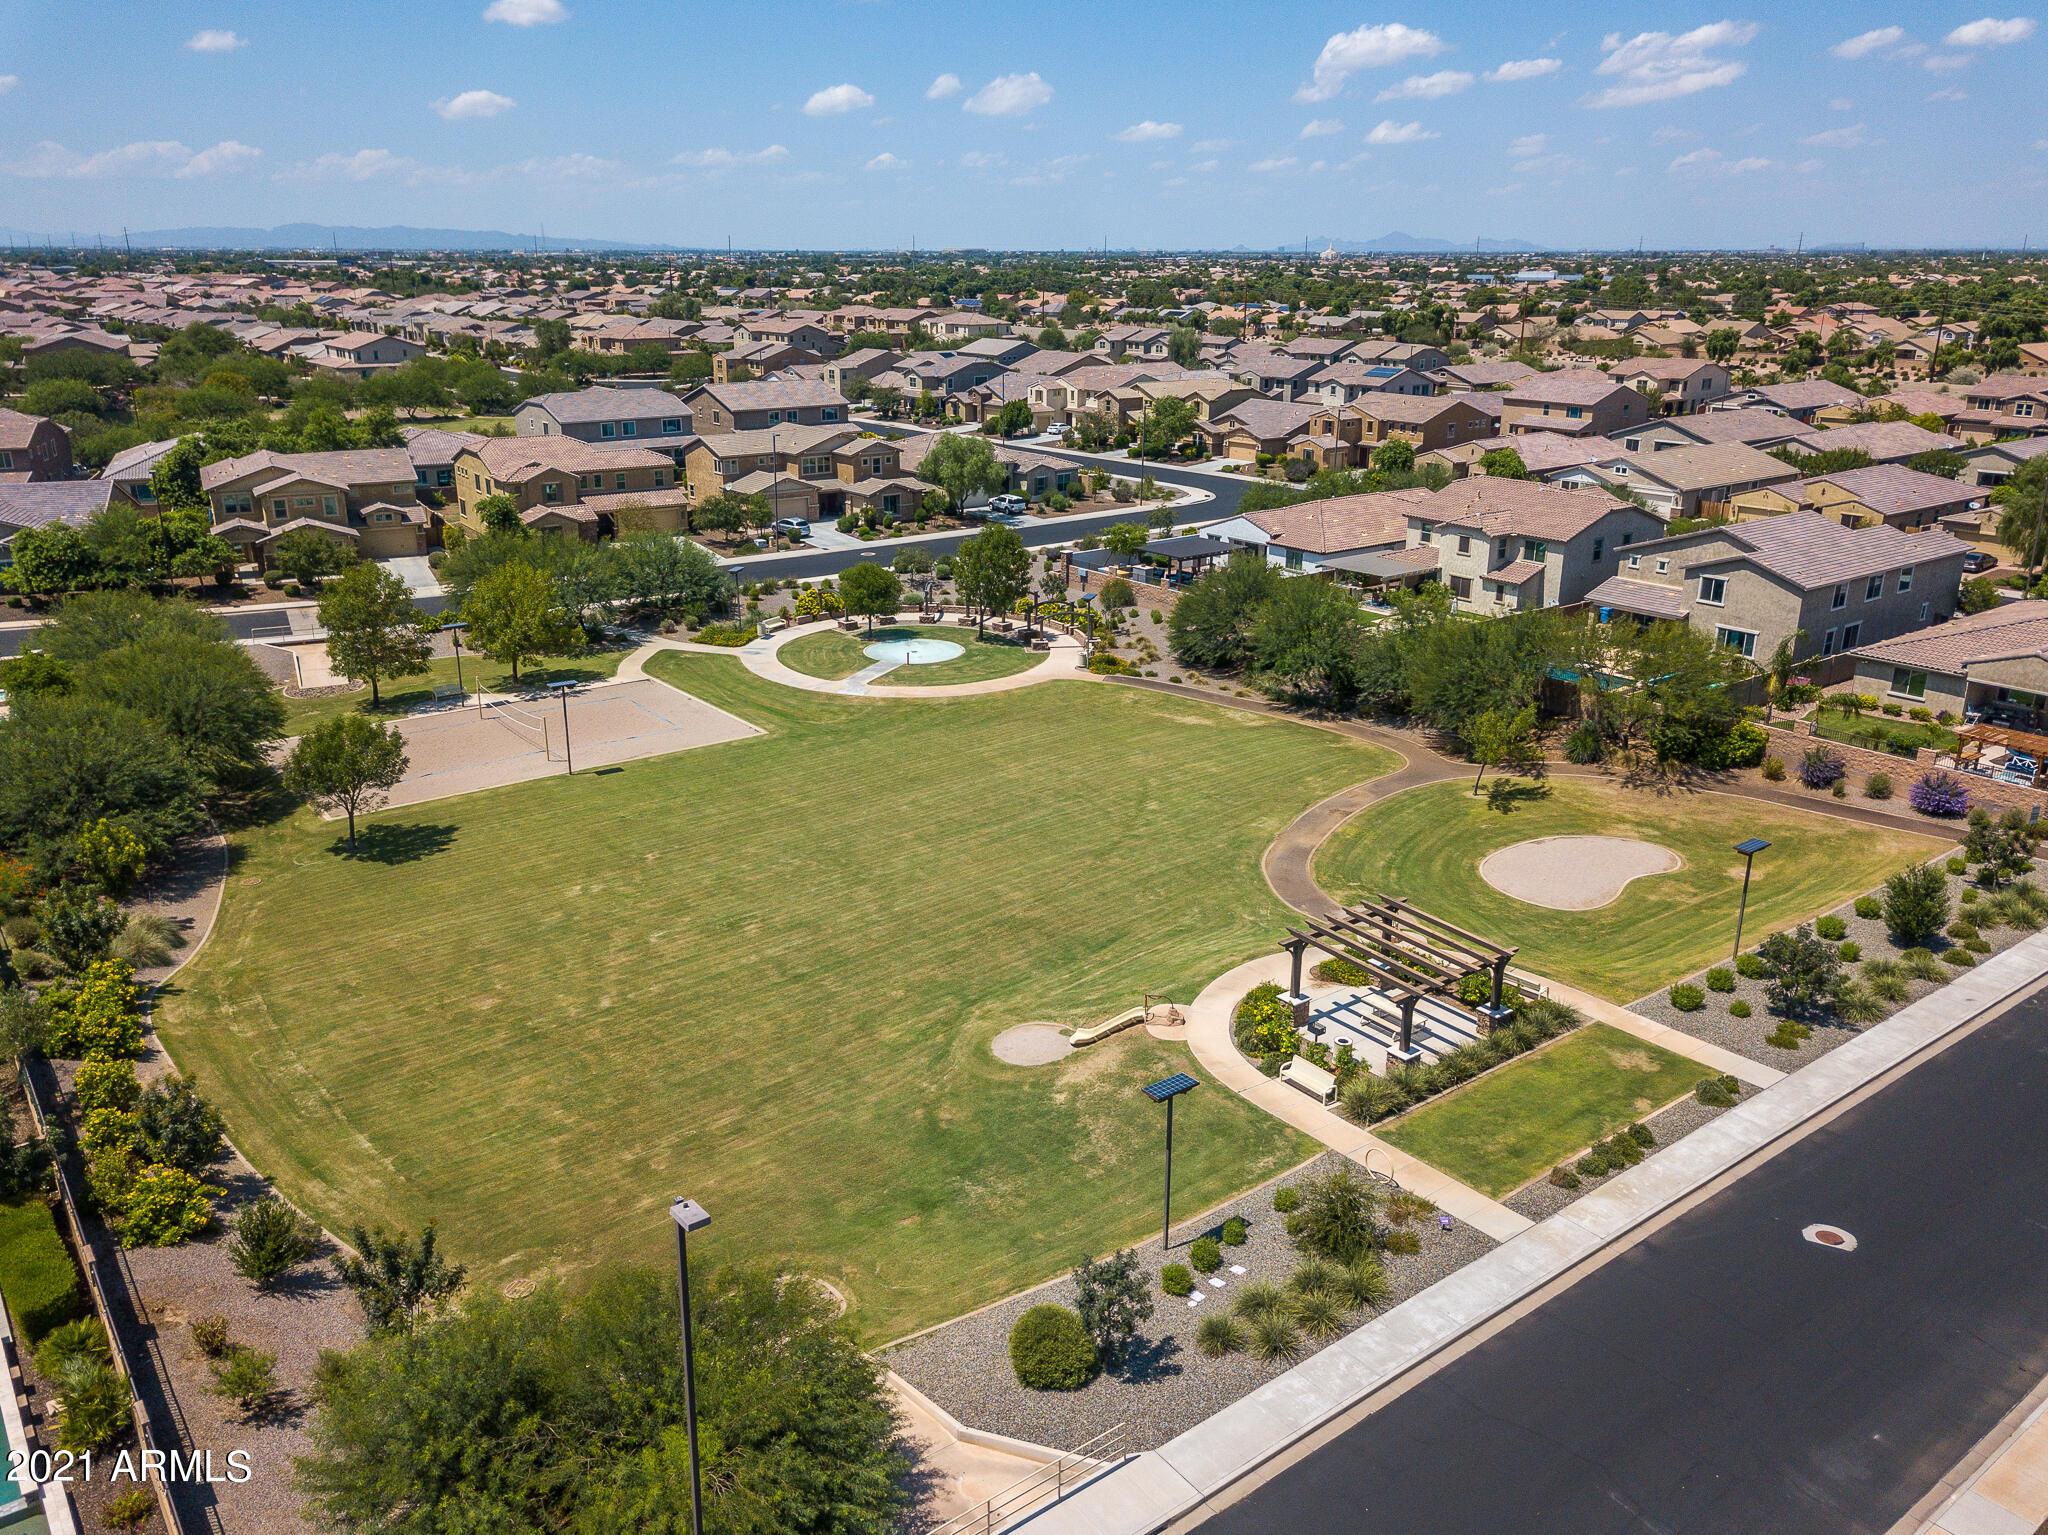 MLS 6300815 4901 S JOSHUA TREE Lane, Gilbert, AZ 85298 Gilbert AZ Scenic